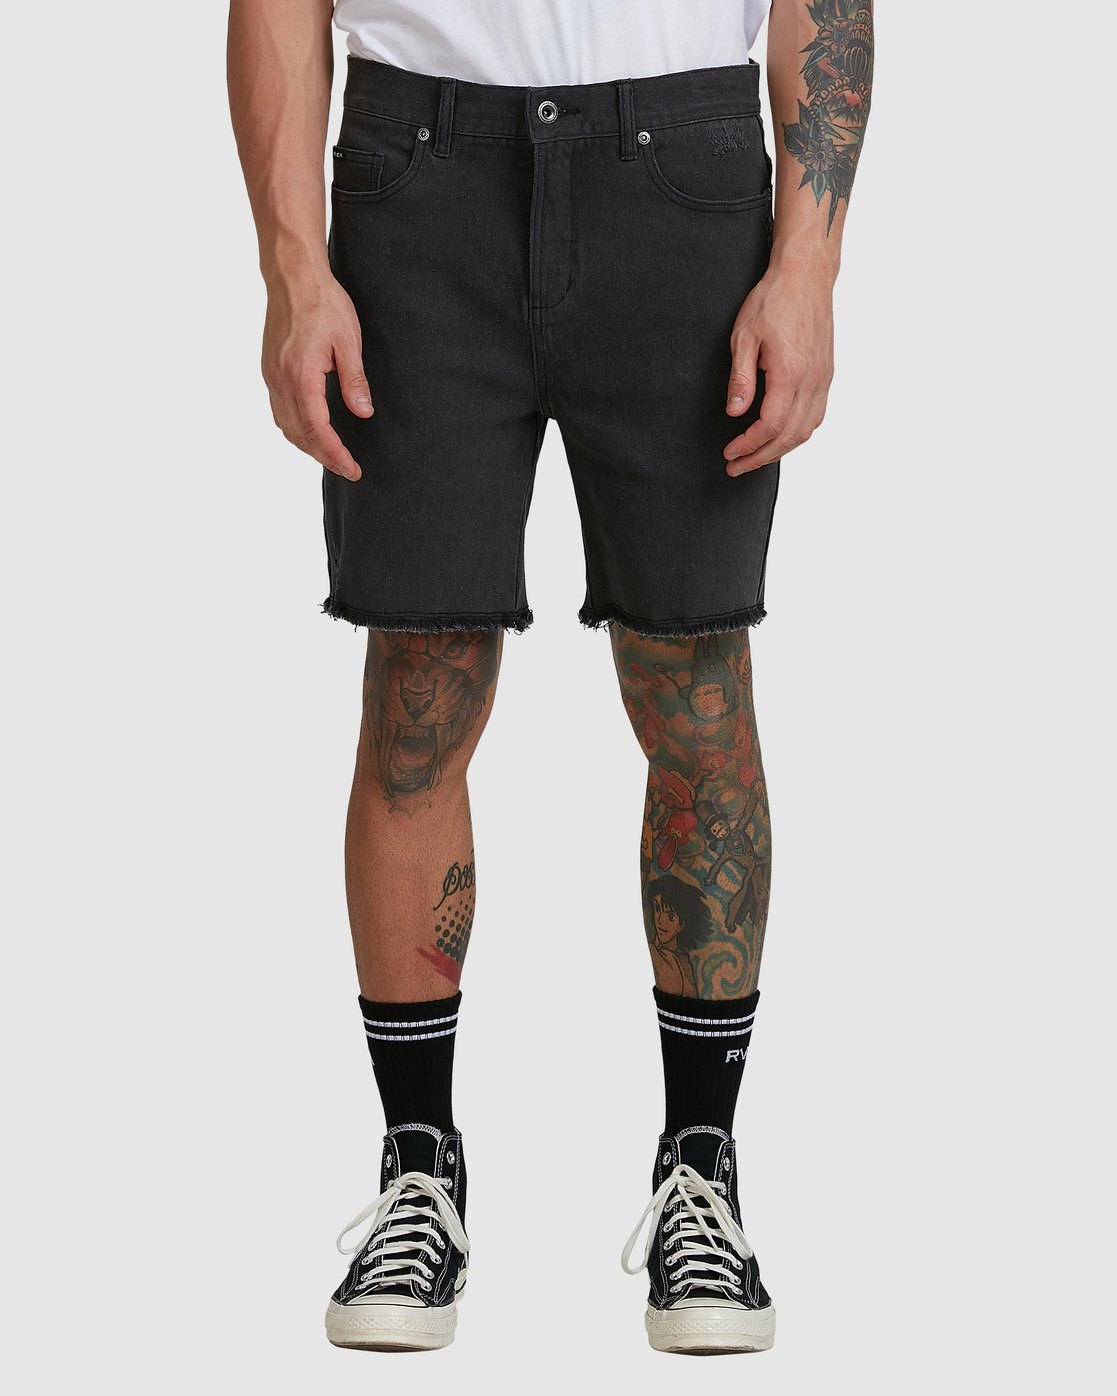 1 Rvca Rockers Walkshort - Black Fade Black R182313 RVCA